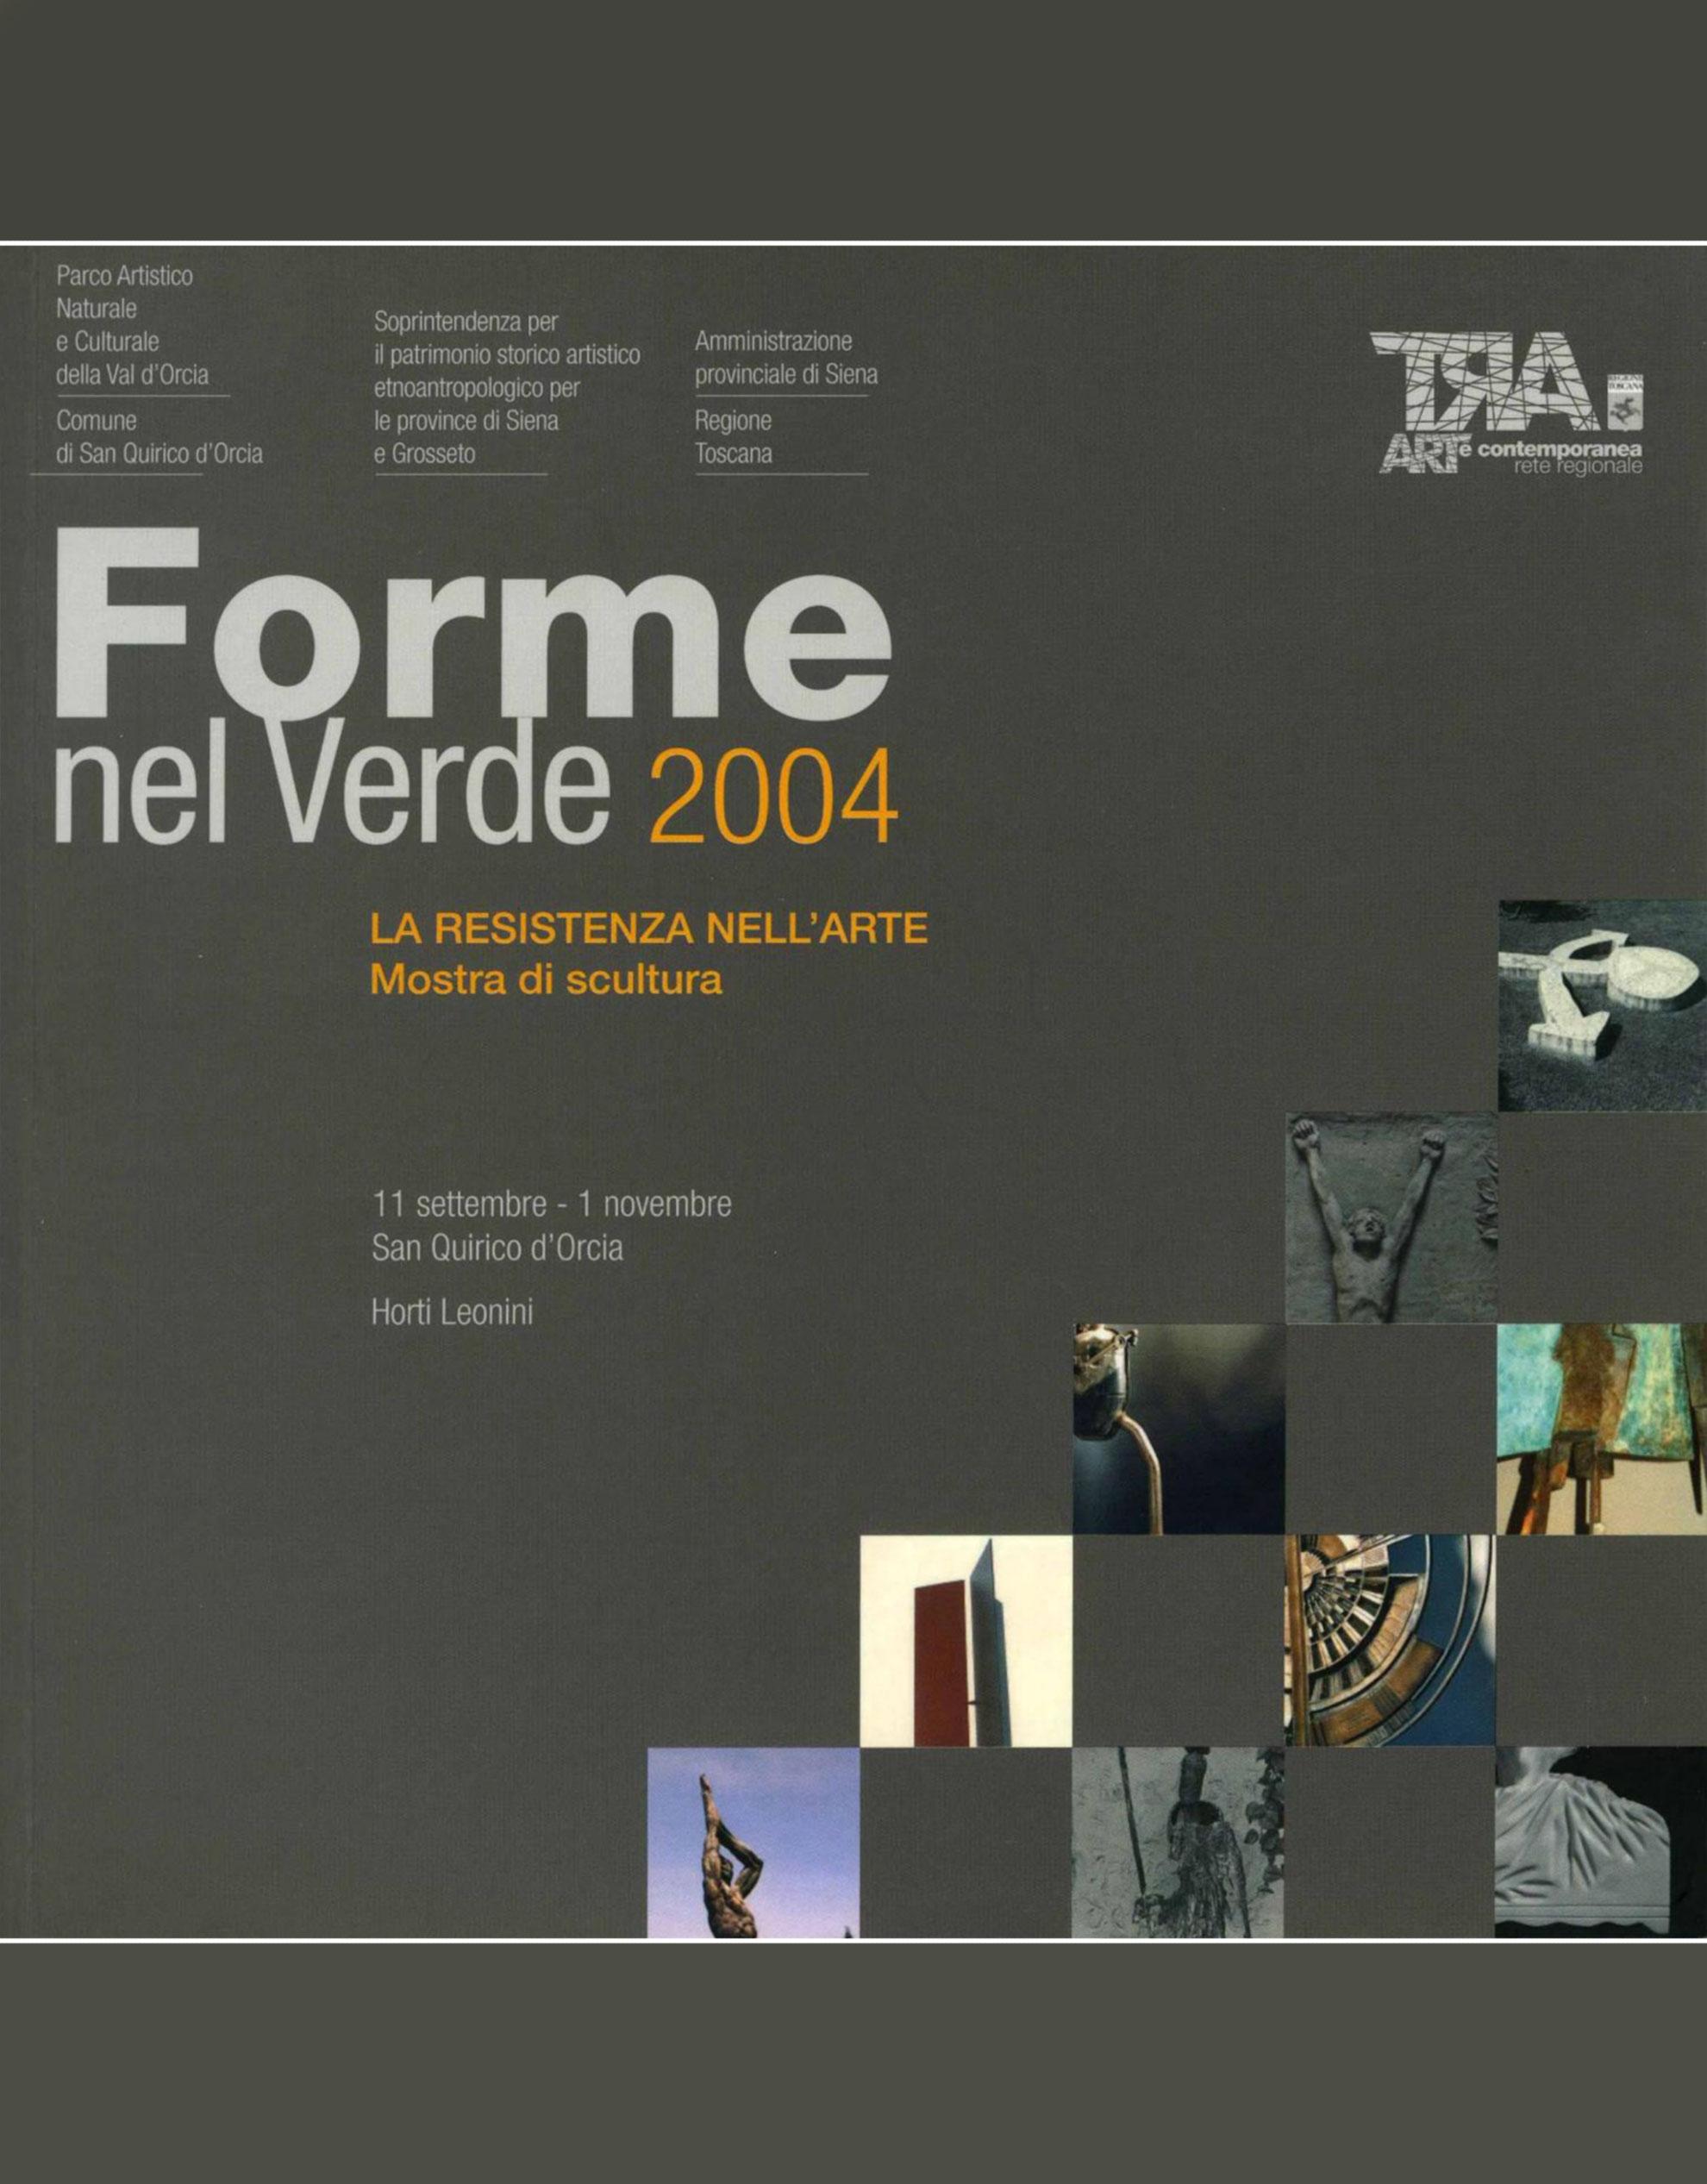 Catalogo Forme nel Verde 2004